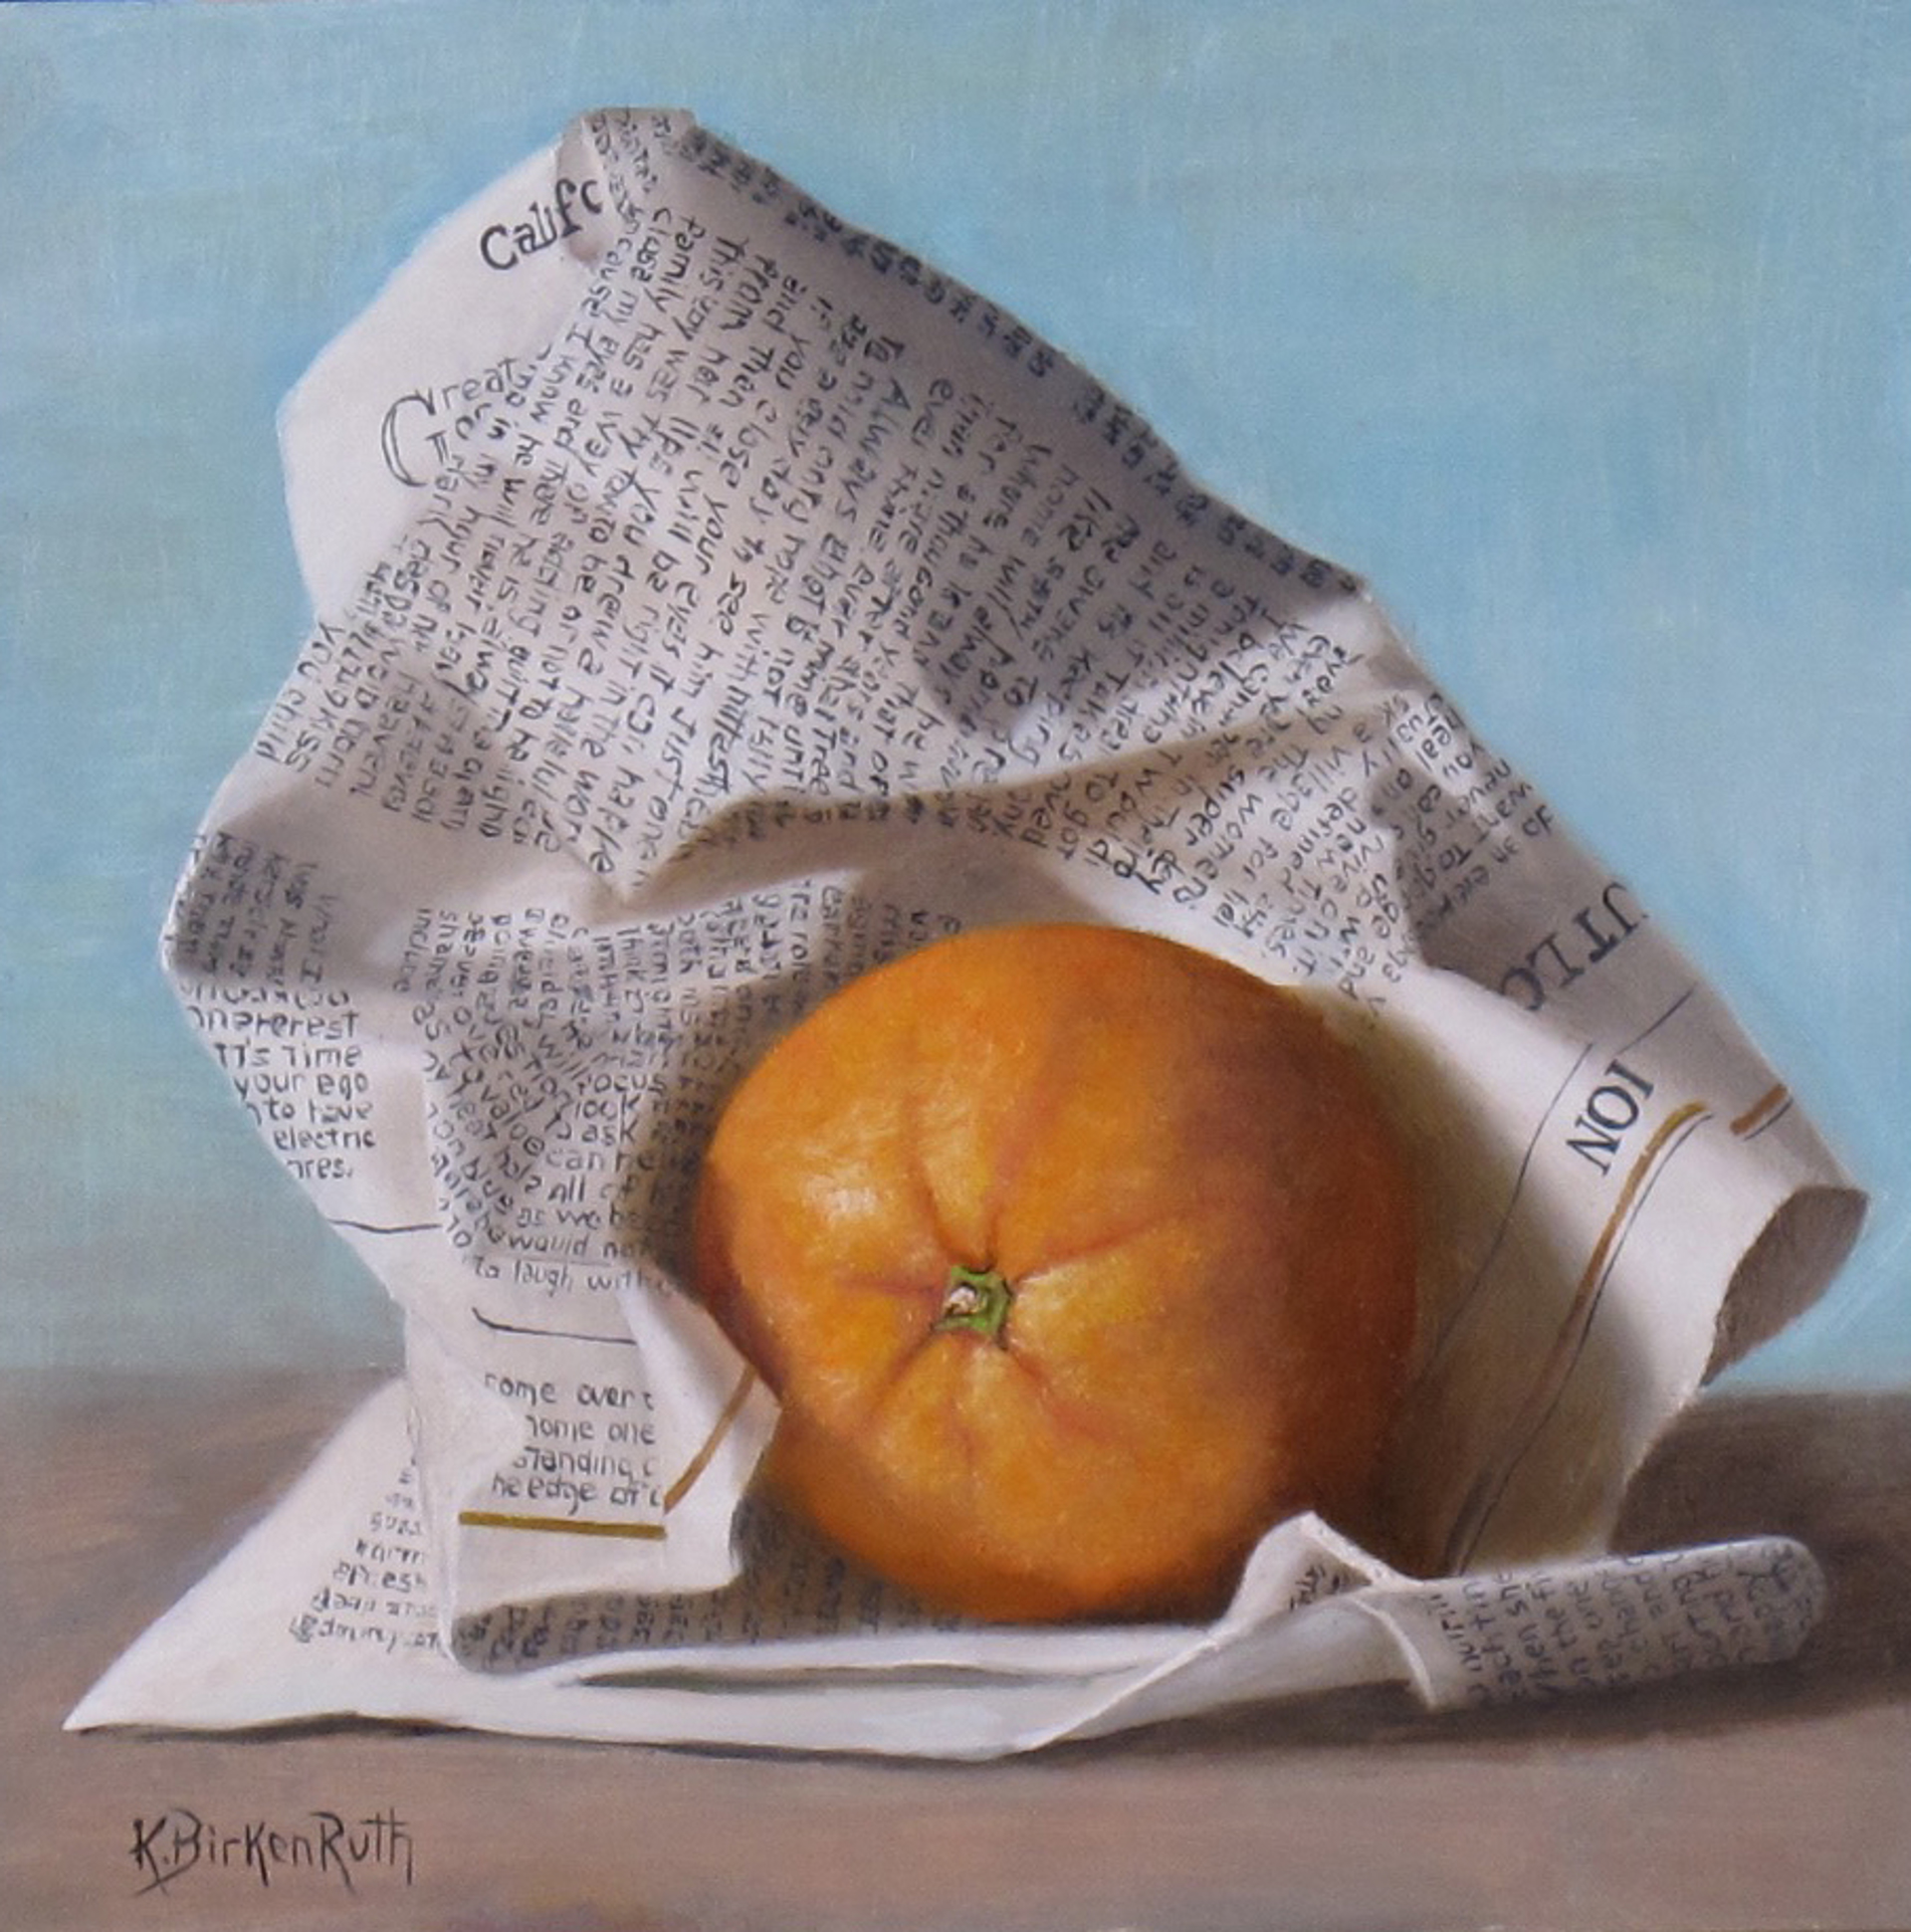 Wrapped Orange by Kelly Birkenruth